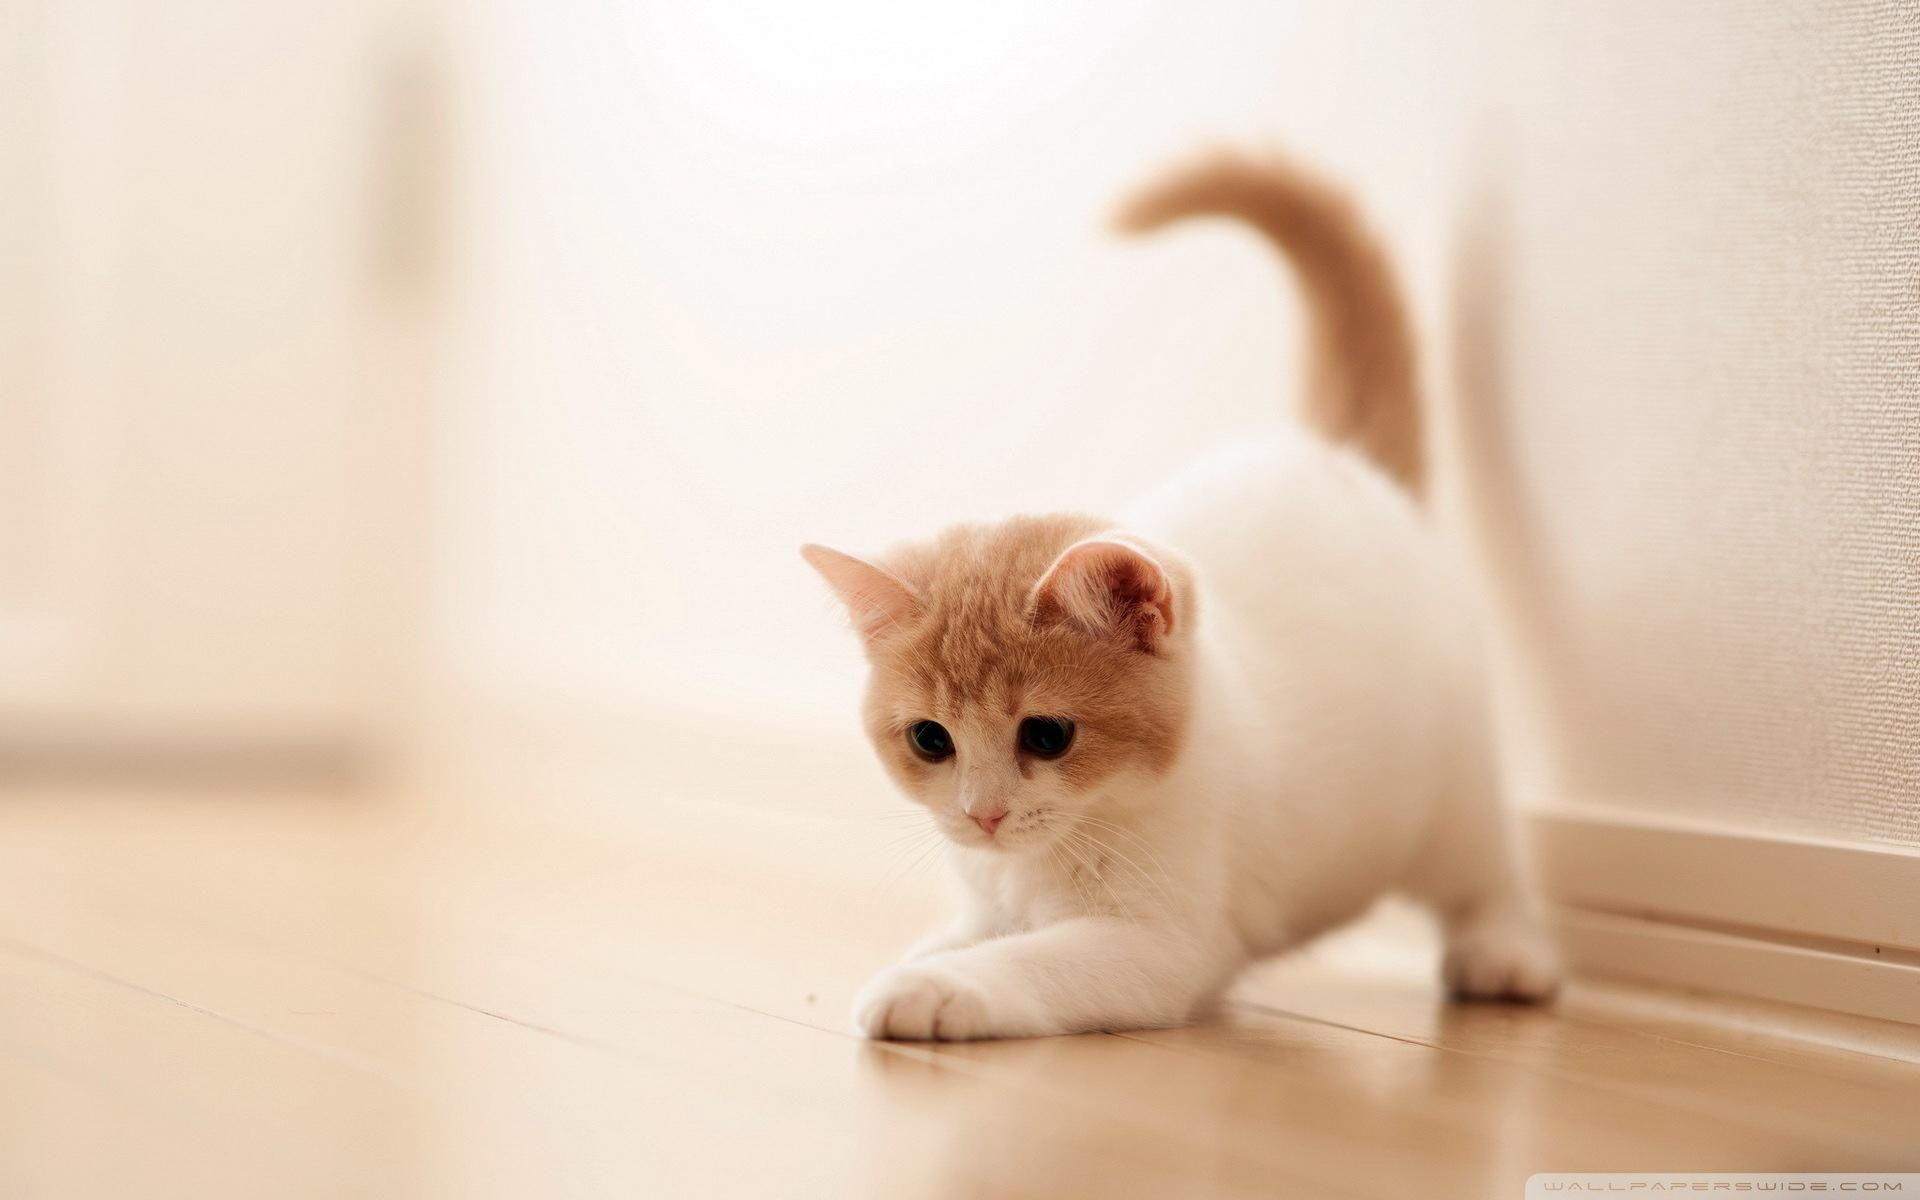 Cute Cat Hd Wallpapers Top Free Cute Cat Hd Backgrounds Wallpaperaccess